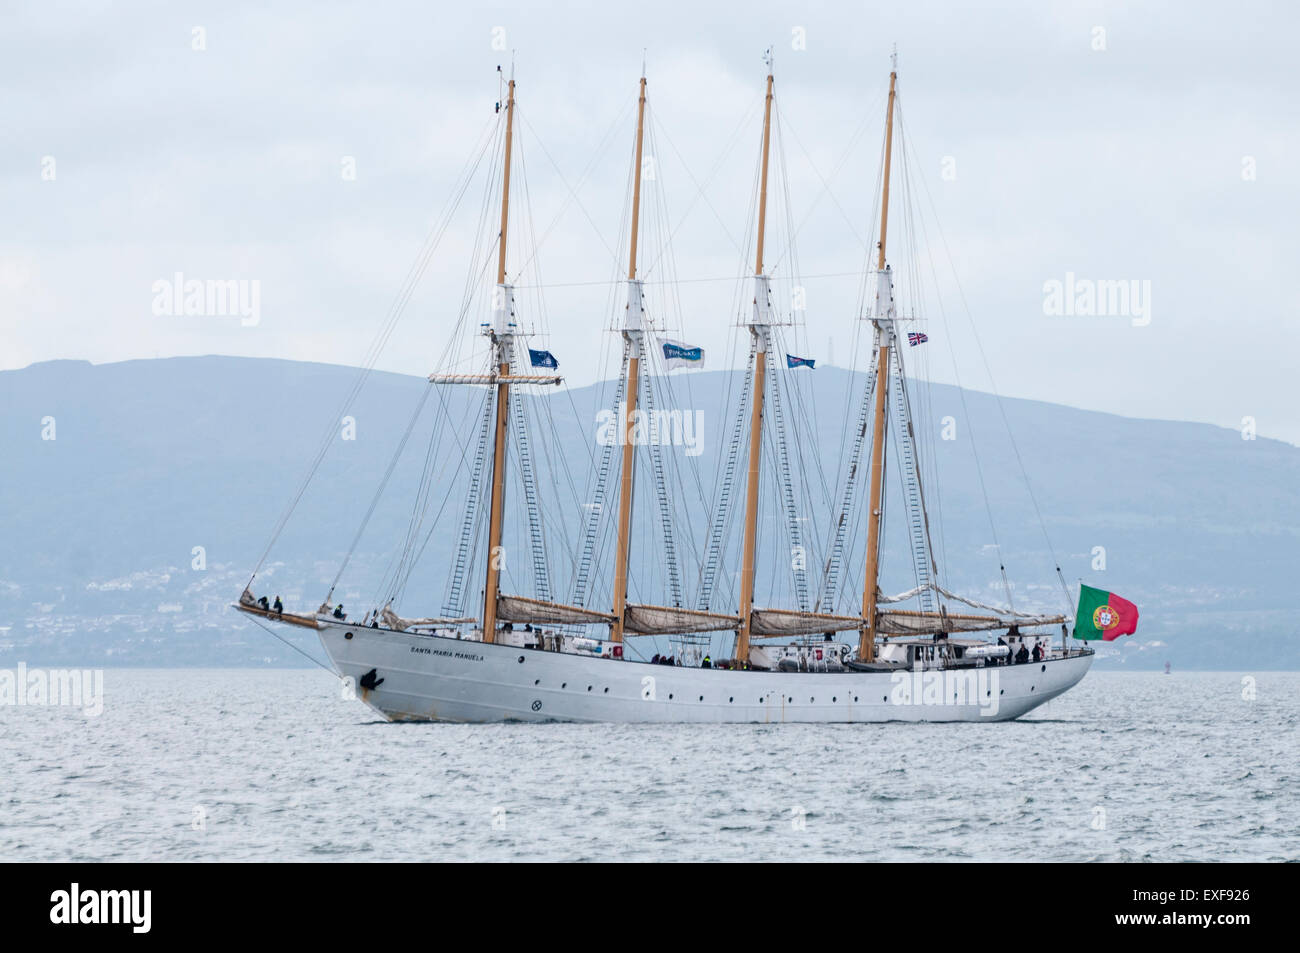 The four masted schooner Santa Maria Manuela sails out of Belfast - Stock Image